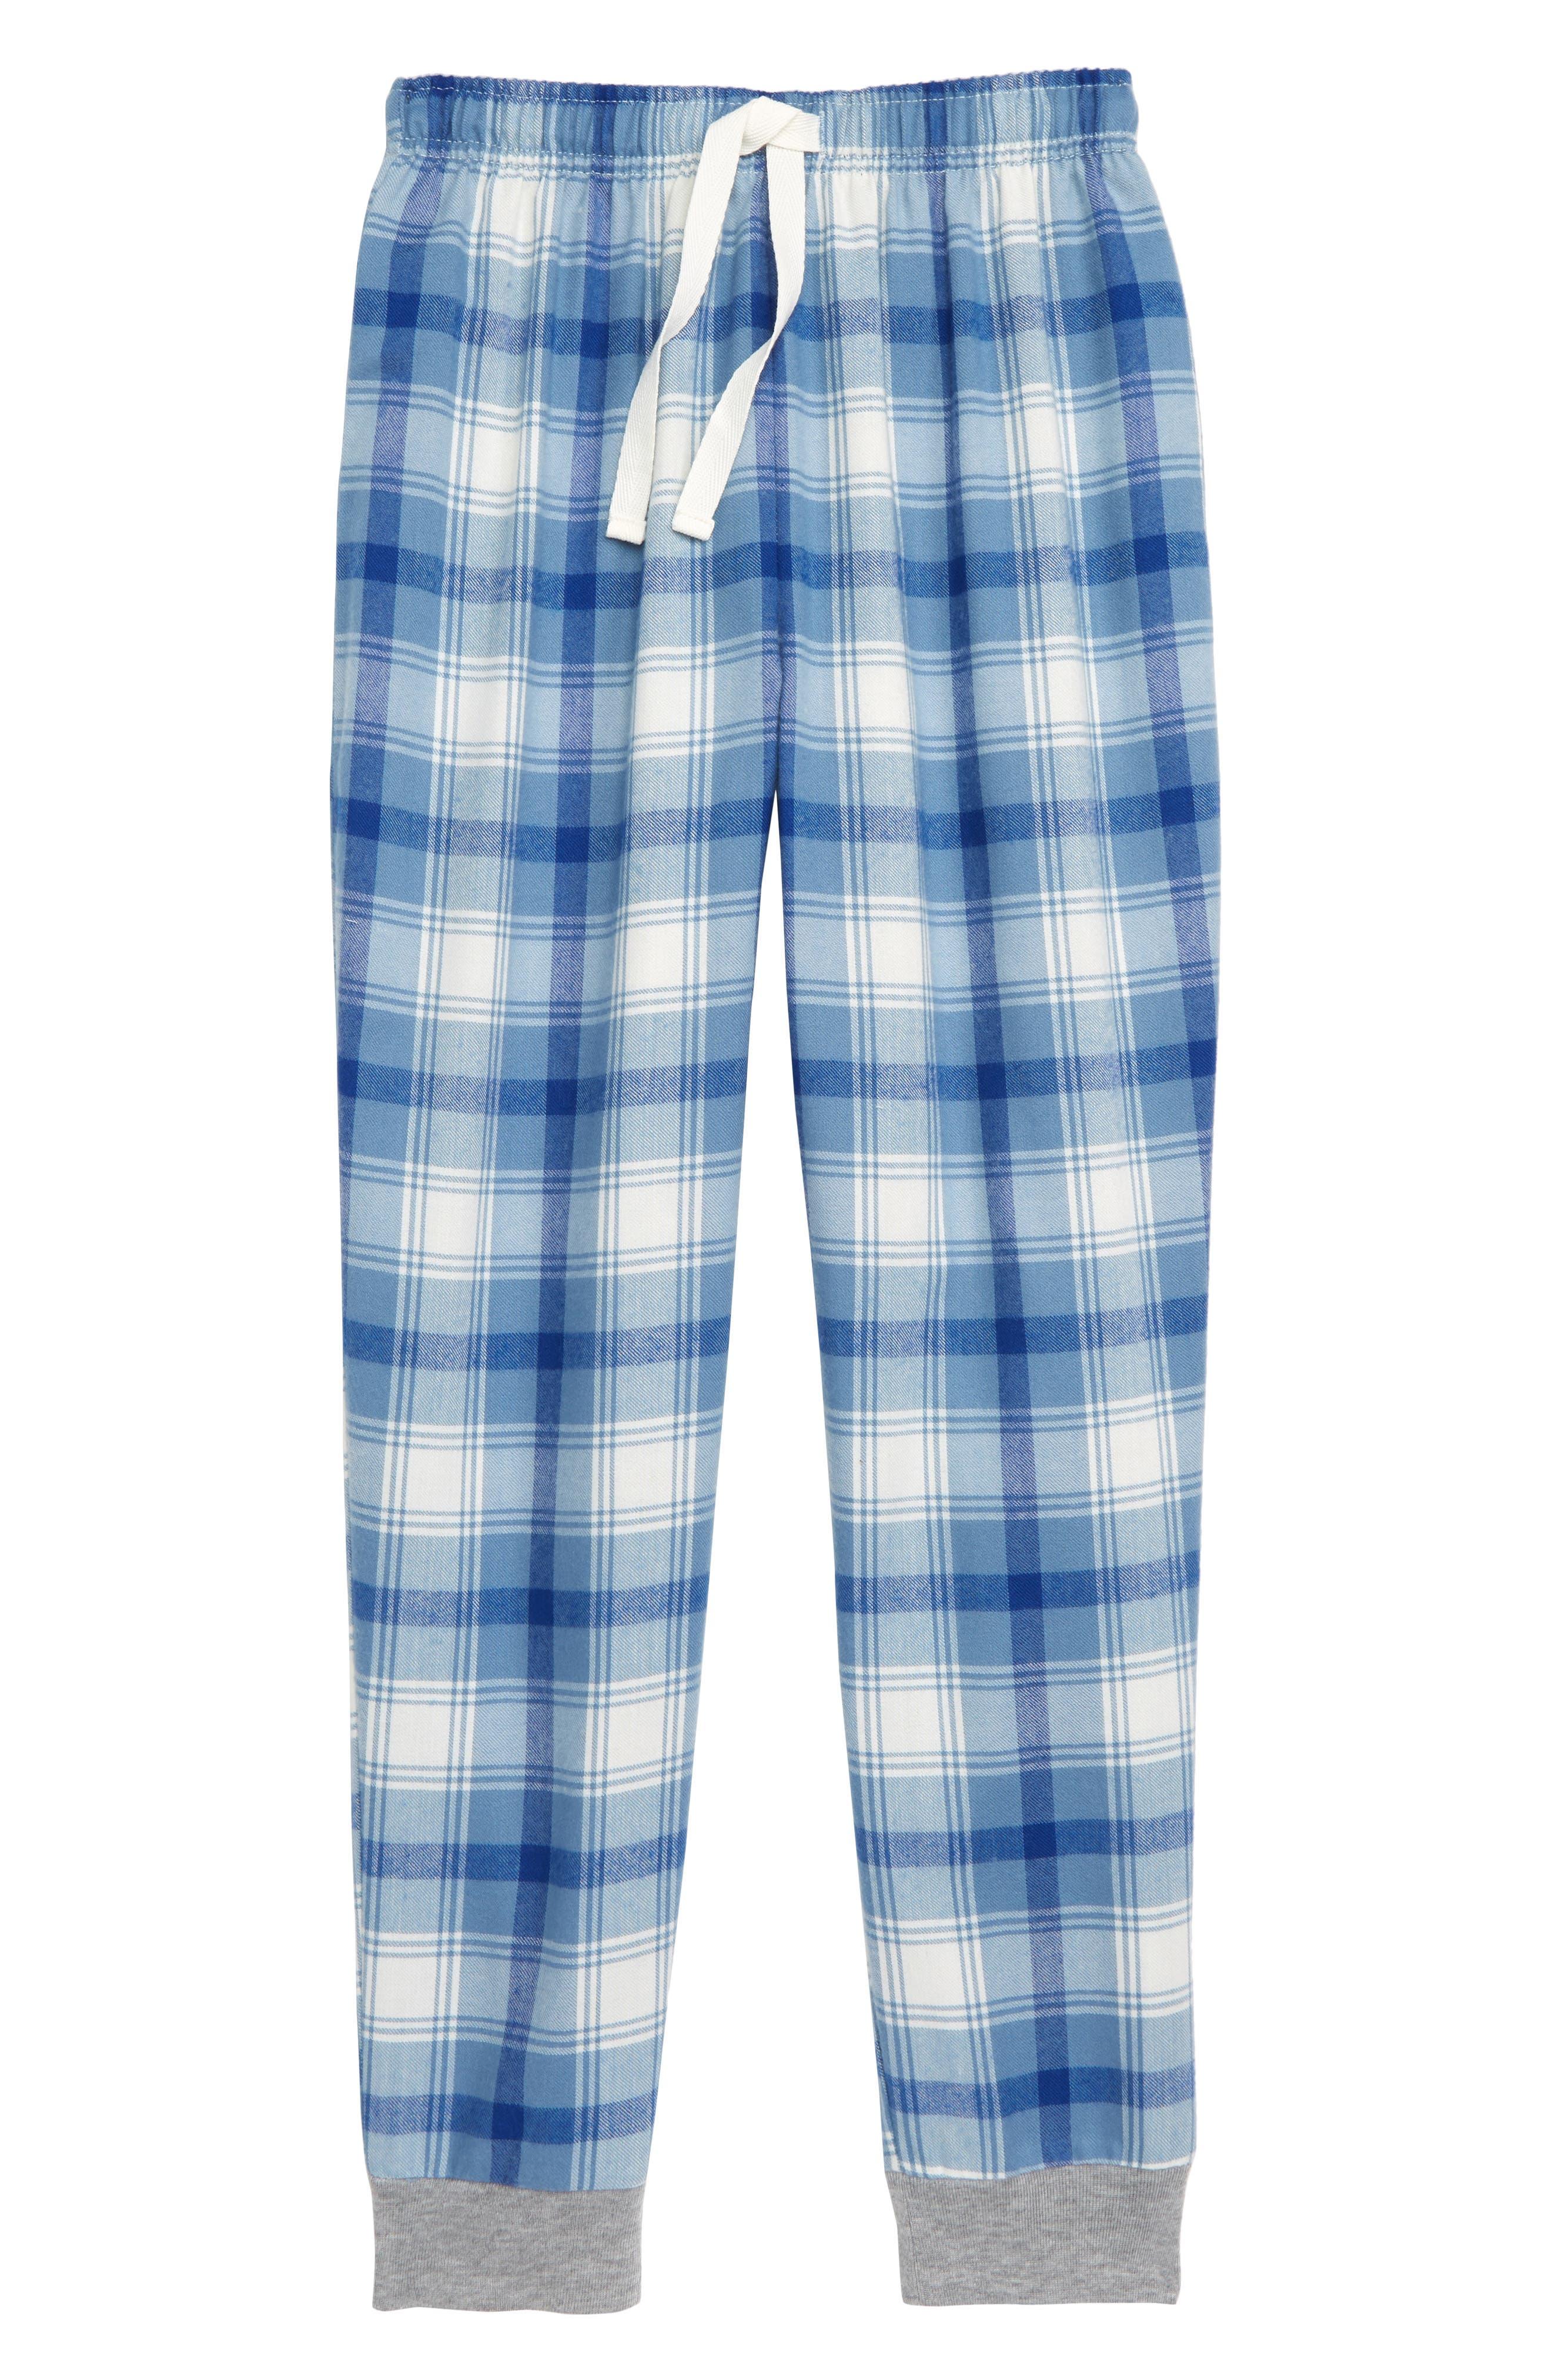 Flannel Jogger Pants,                             Main thumbnail 1, color,                             451